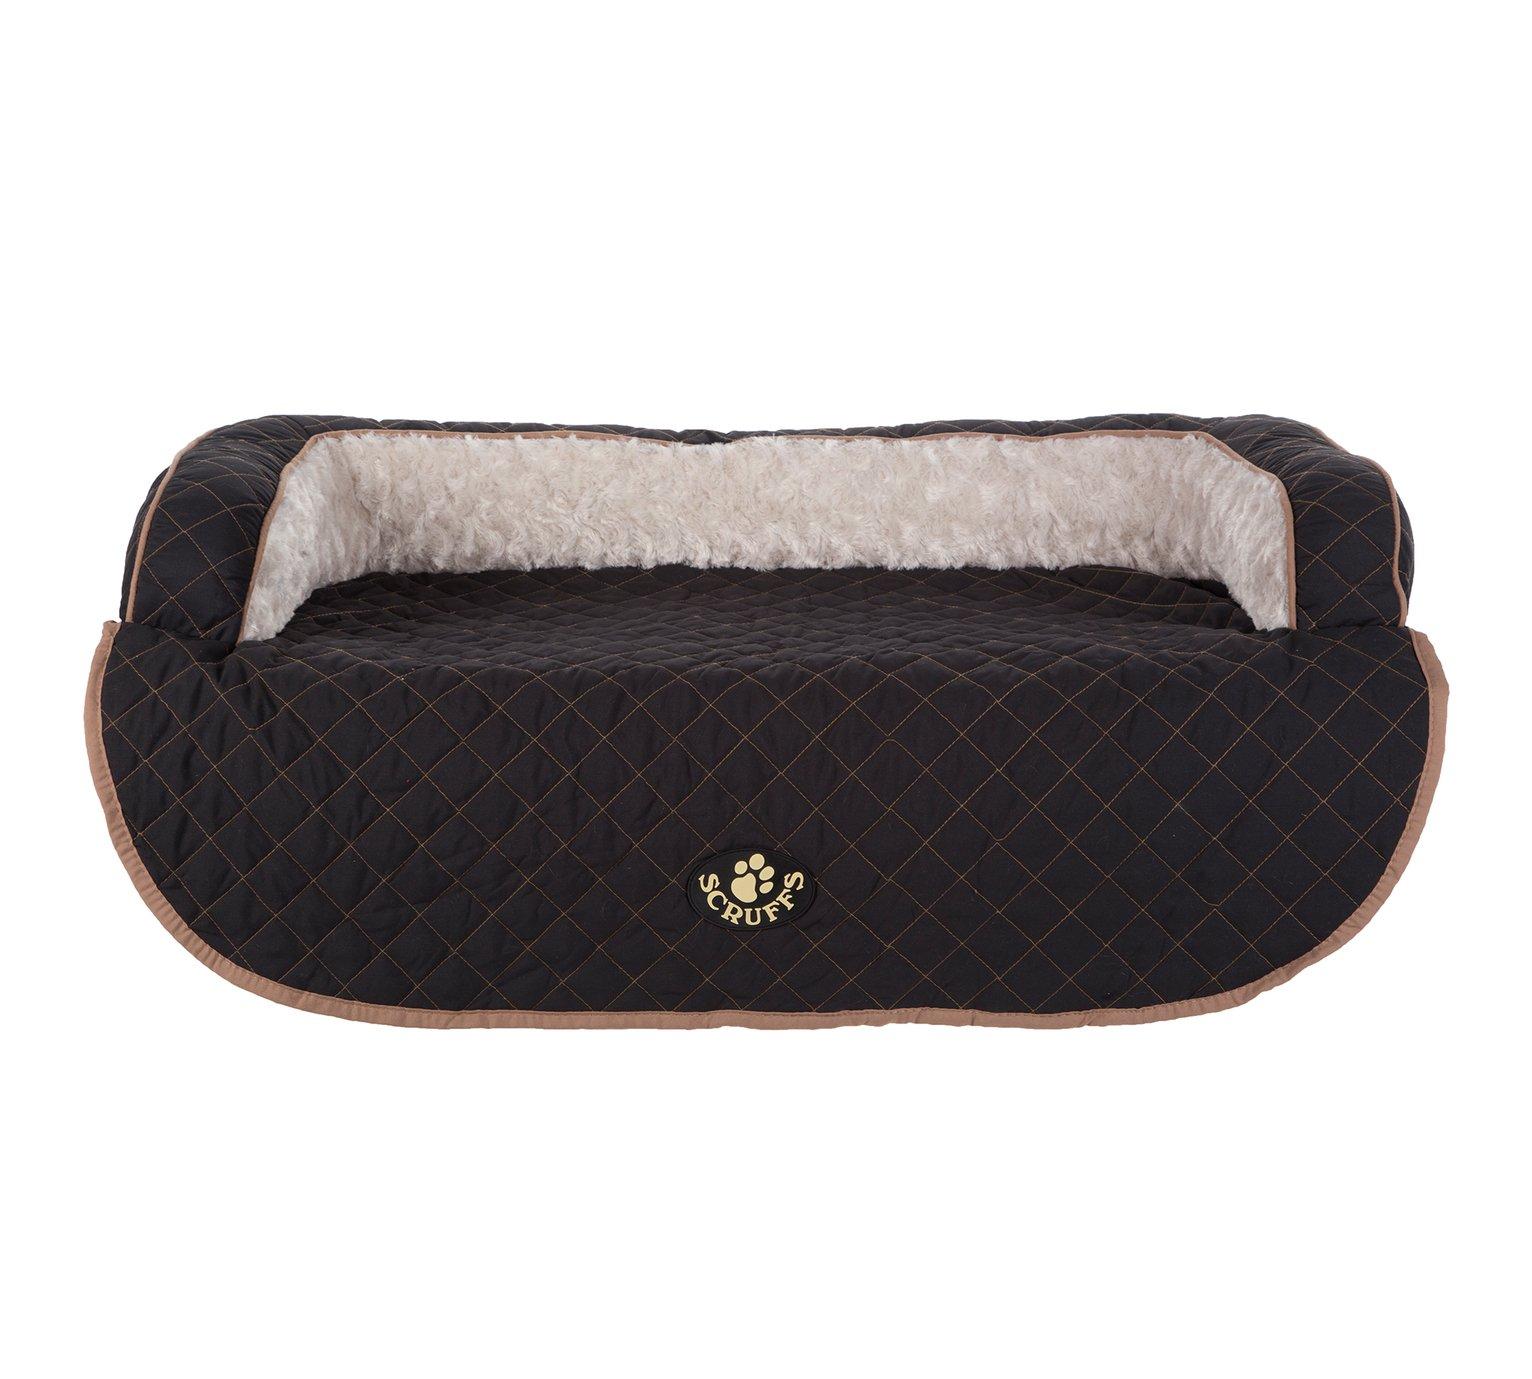 Scruffs Wilton Pet Sofa Bed - Large